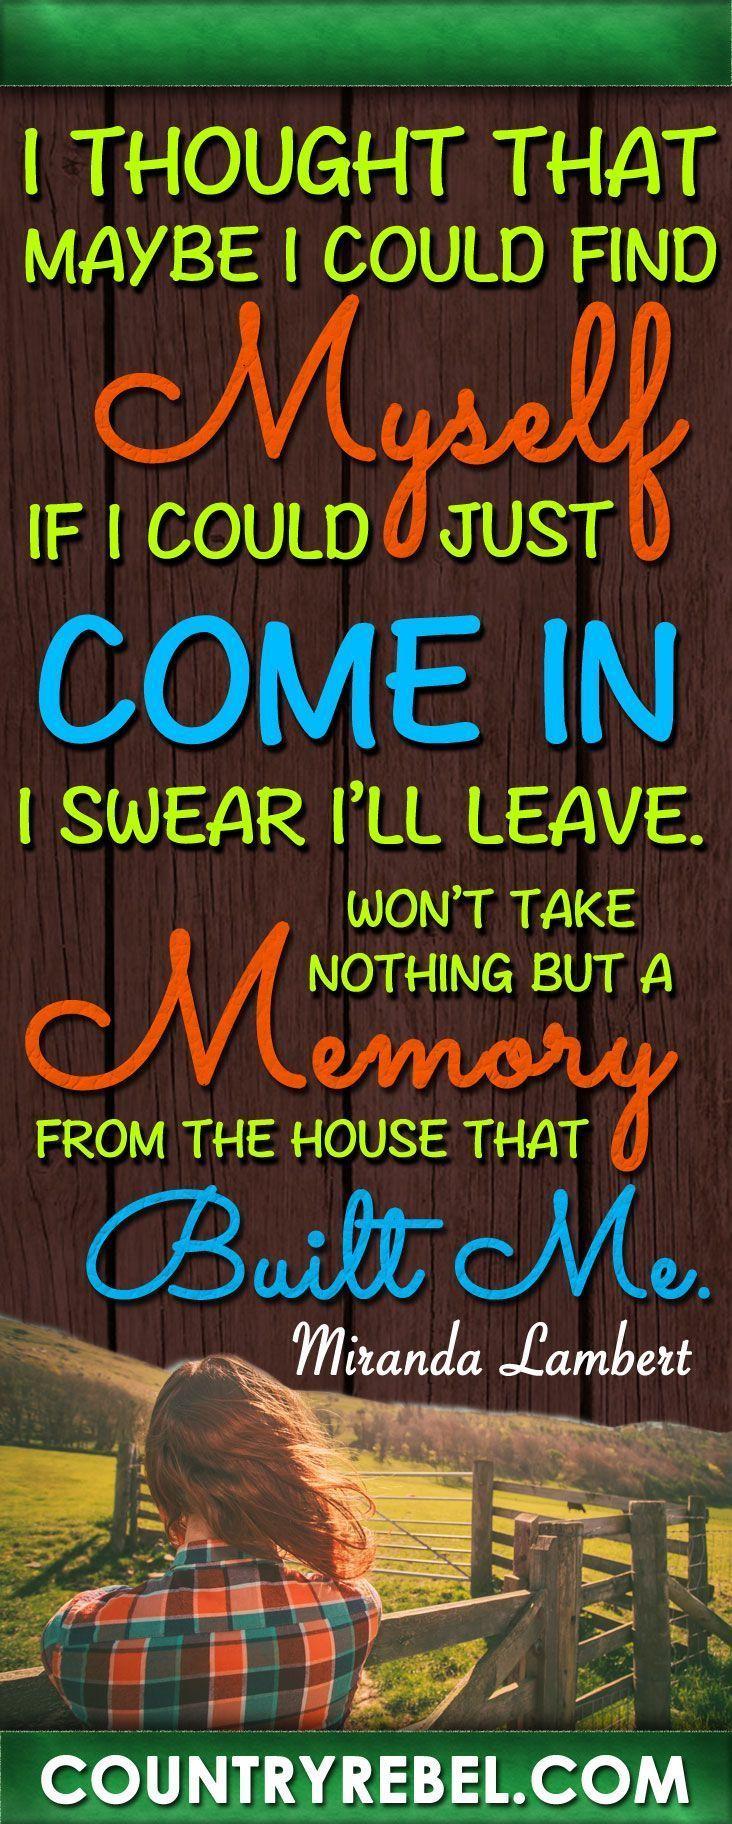 Miranda Lambert - The House That Built Me